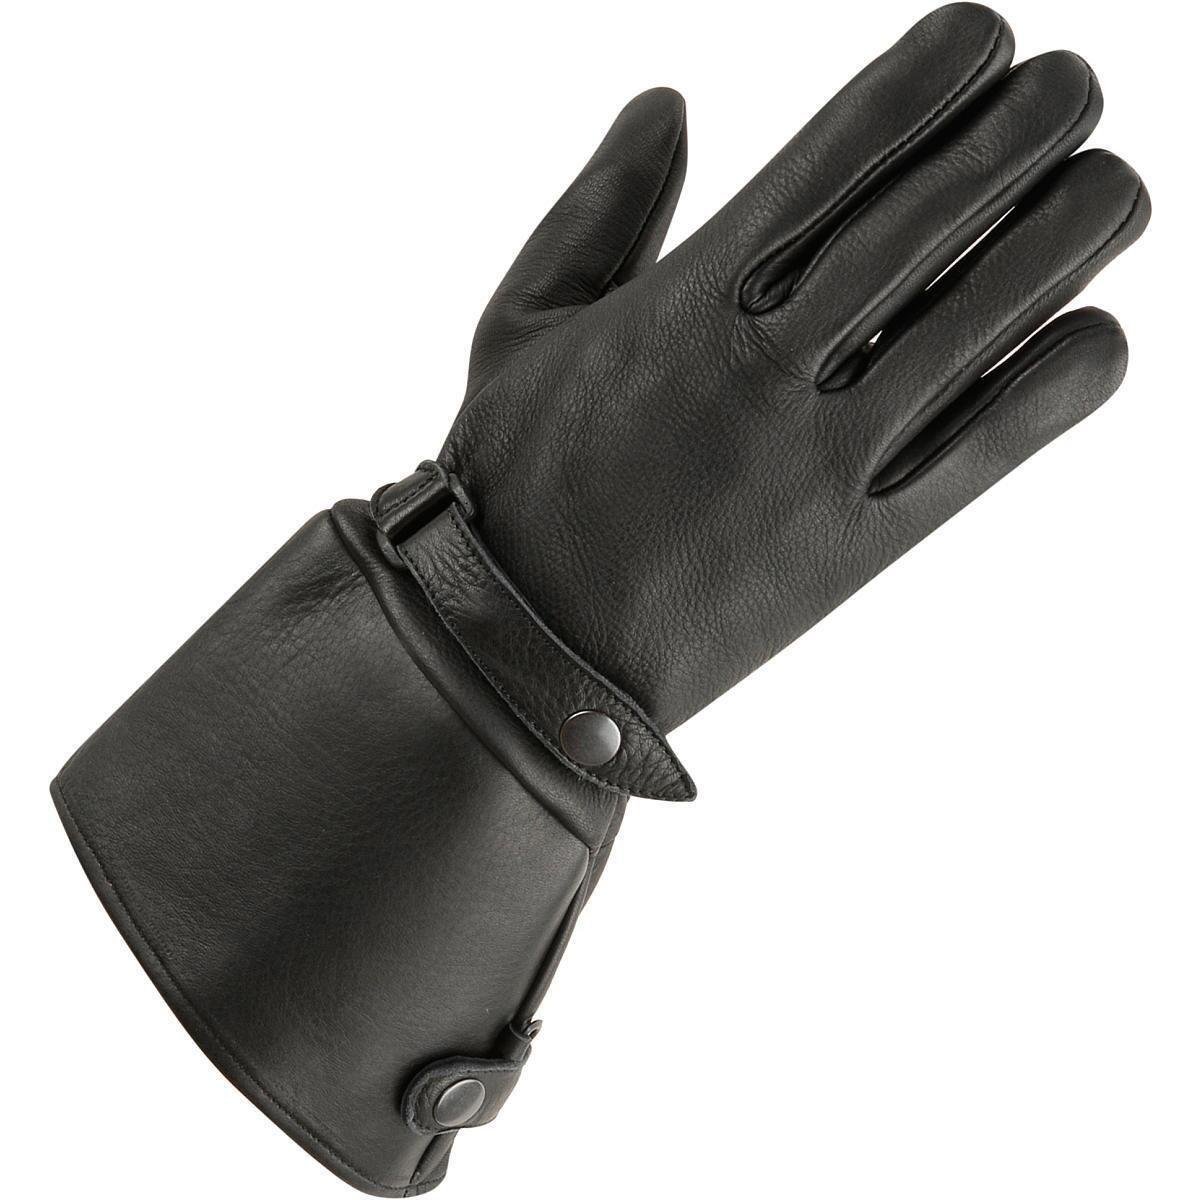 Yoko motorcycle gloves - Yoko Motorcycle Gloves 24